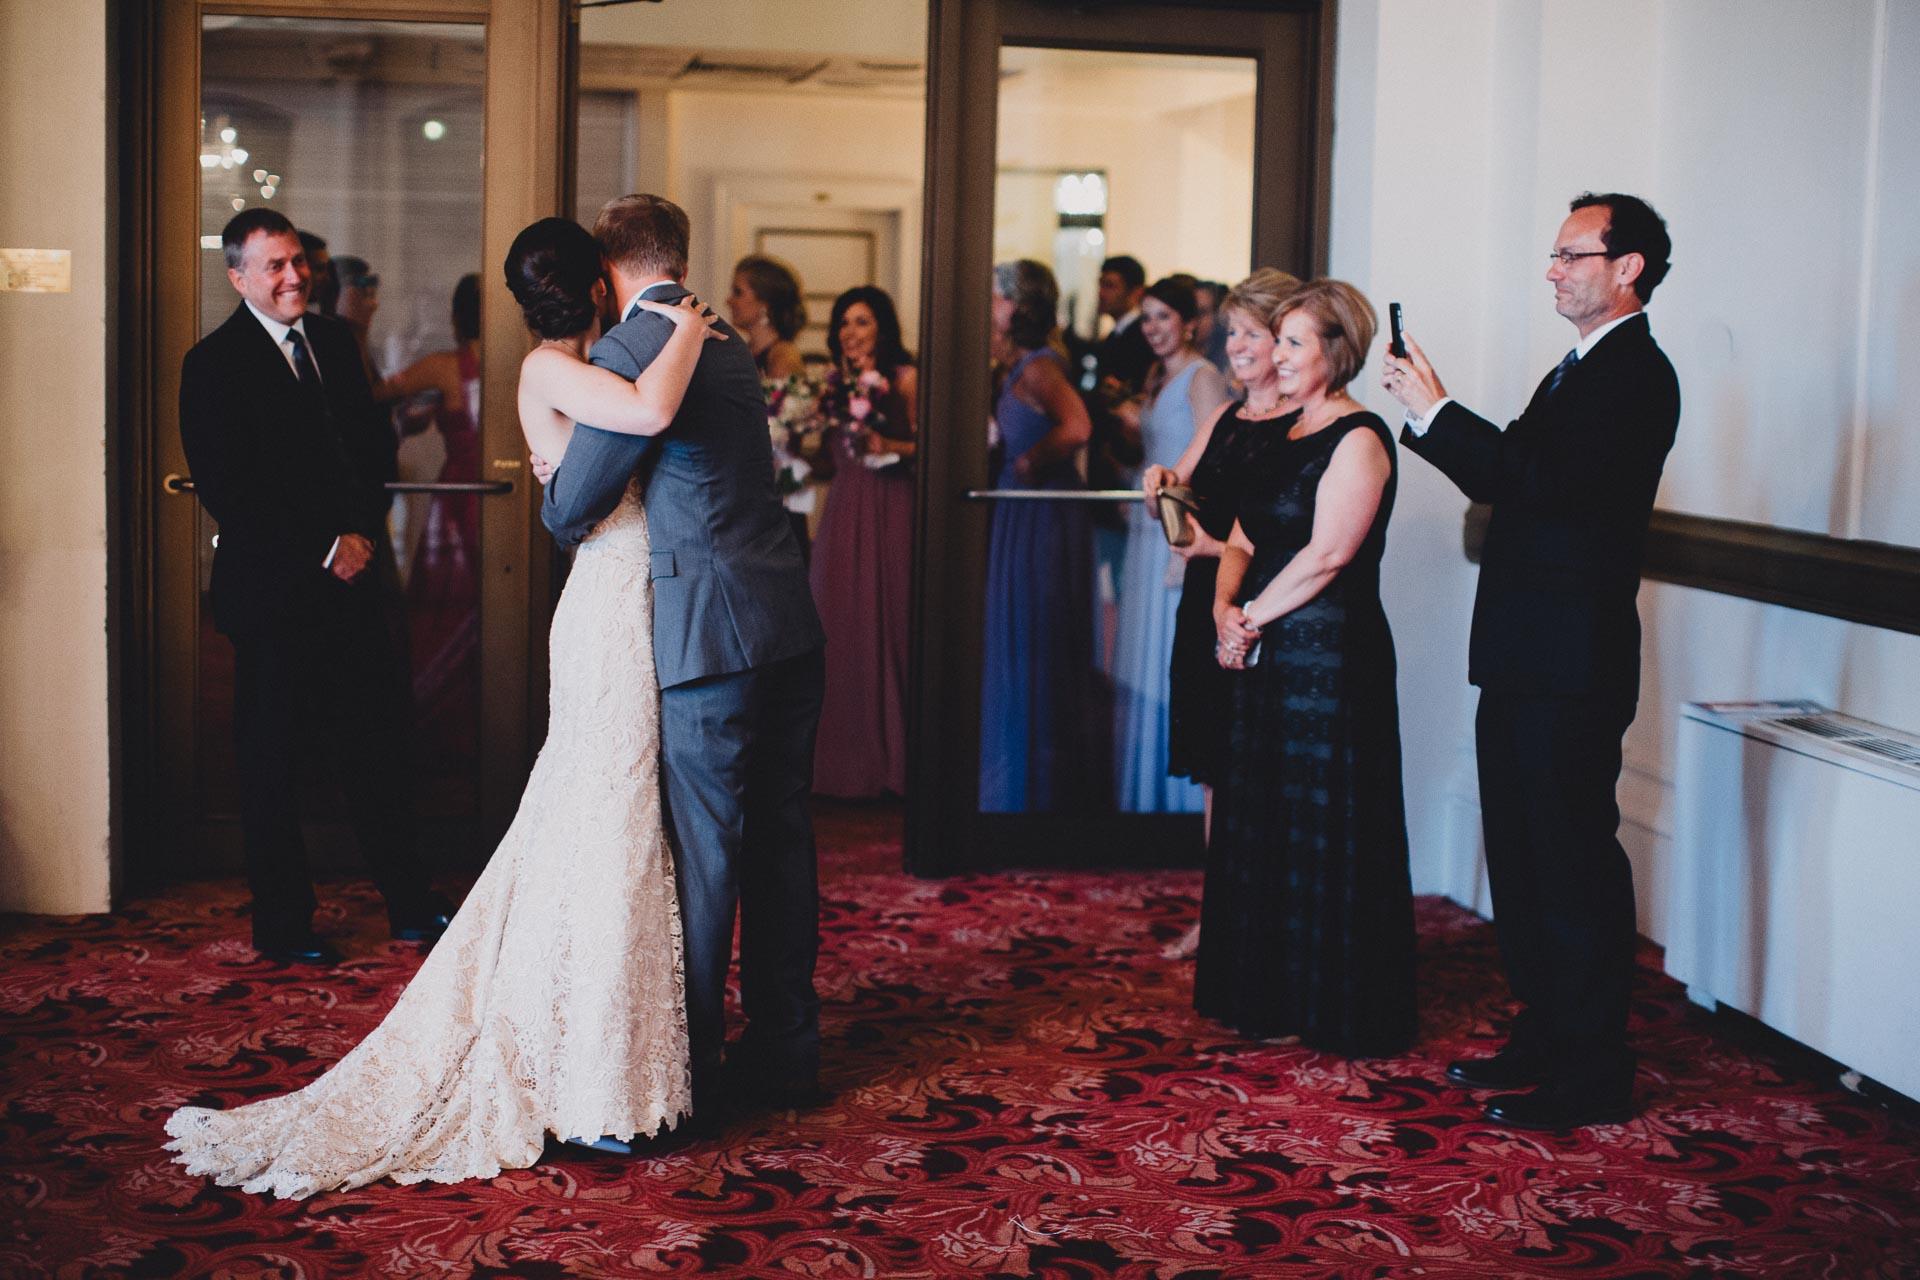 Julia-Michael-Cincinnati-Music-Hall-Wedding-047@2x.jpg